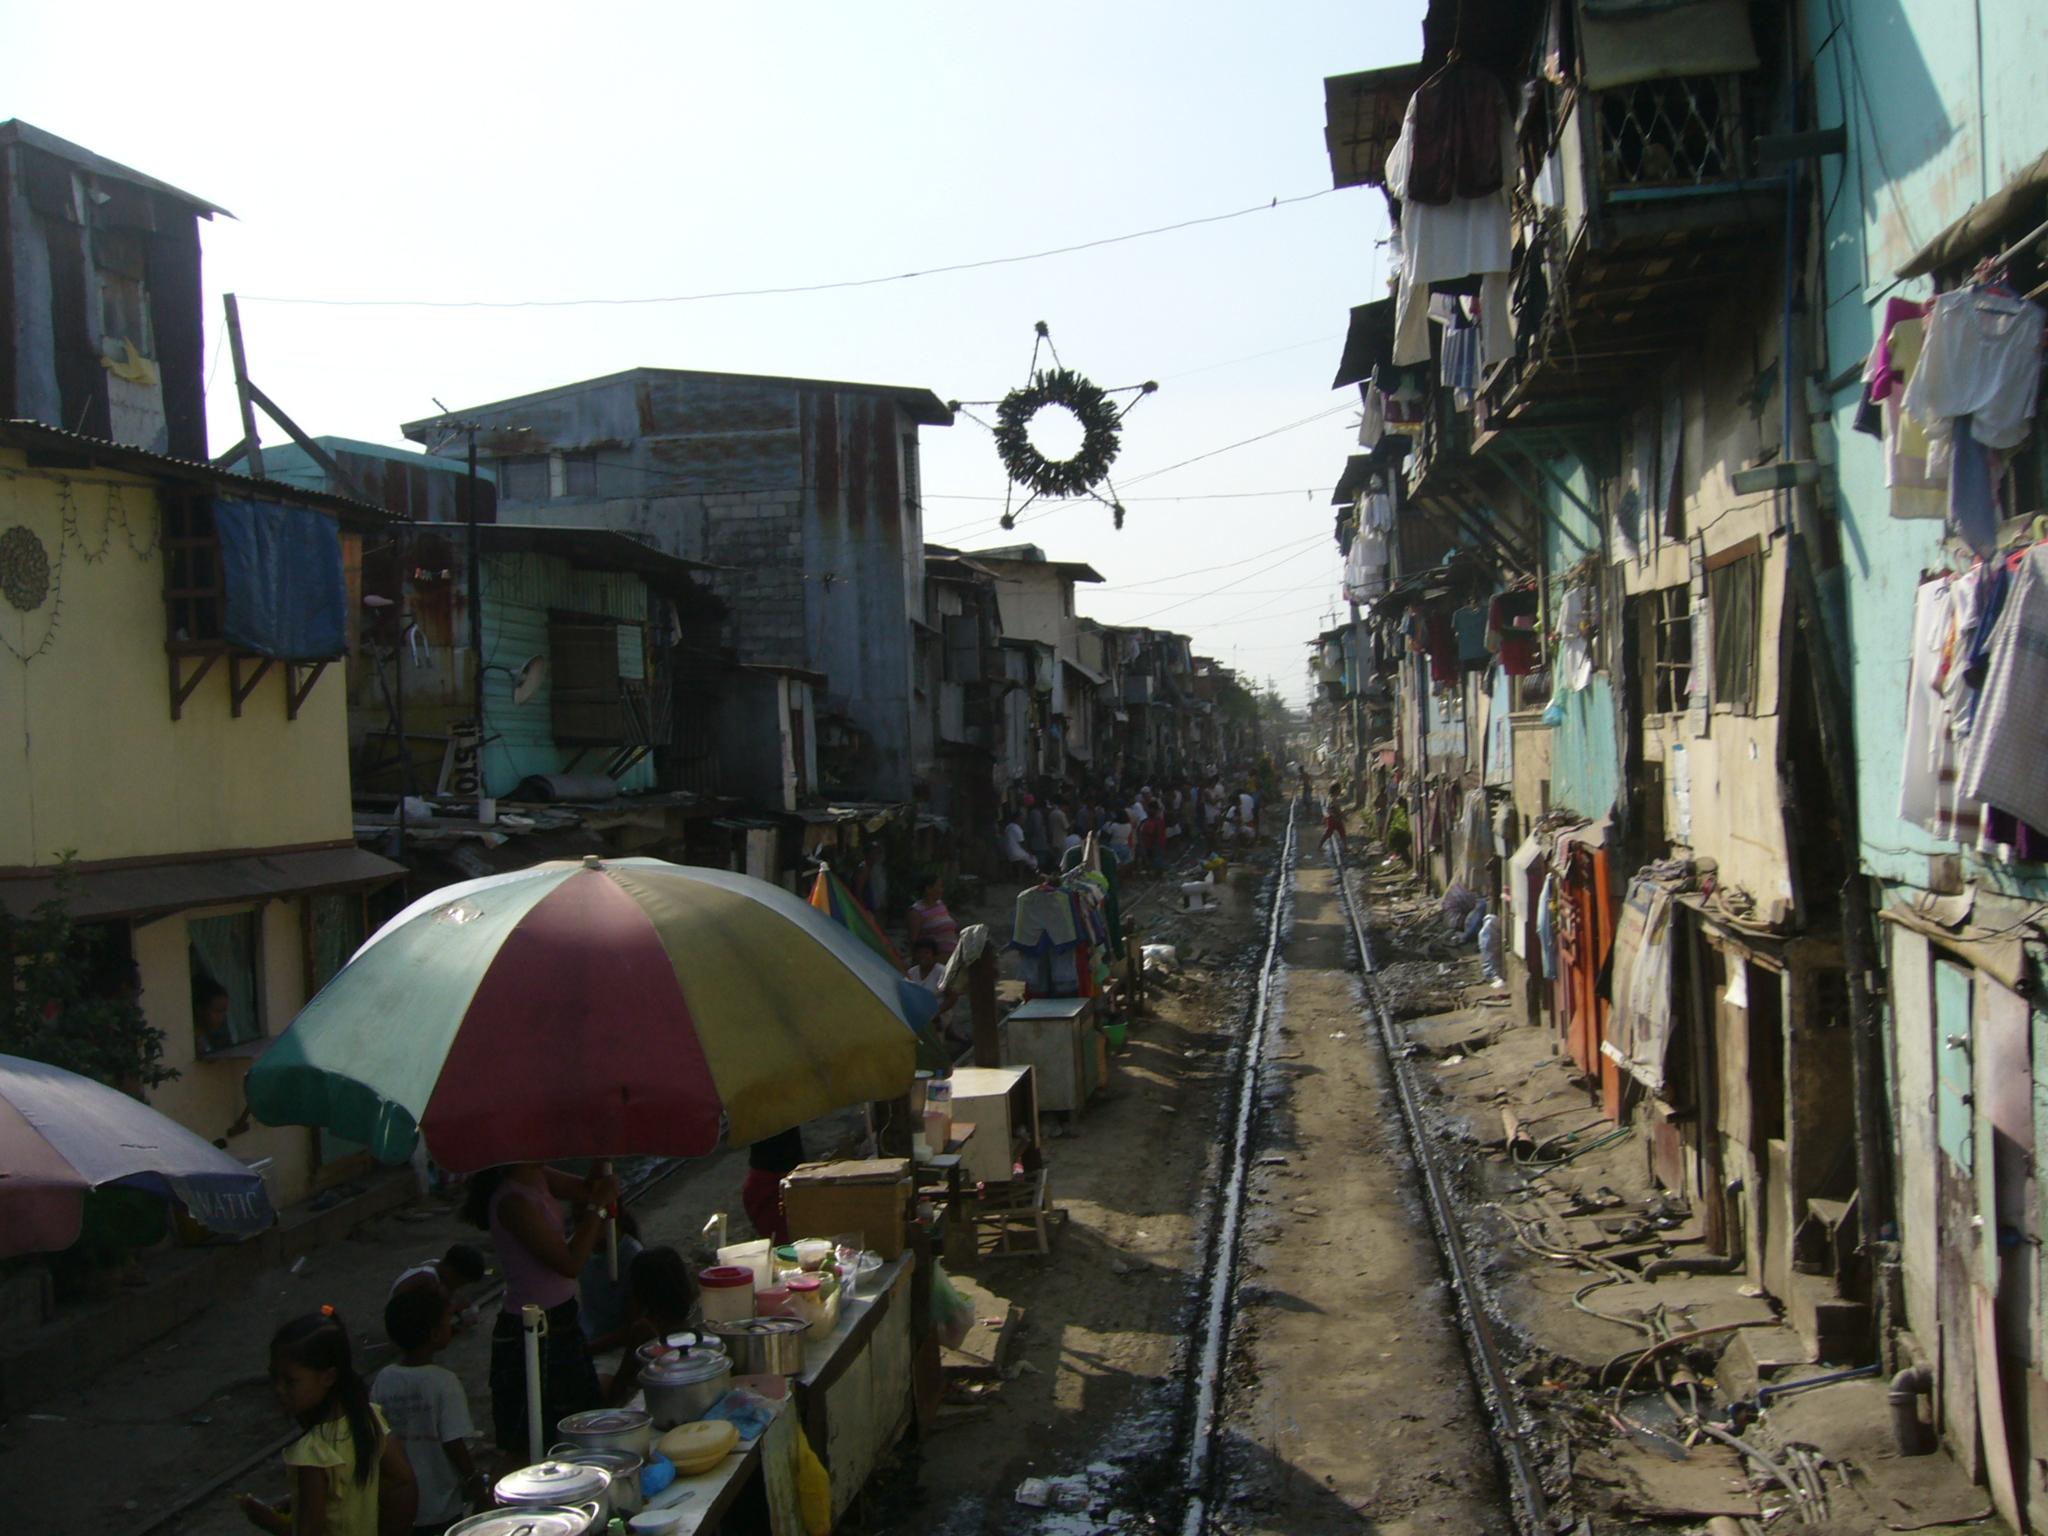 Slums on Philippines National Railway